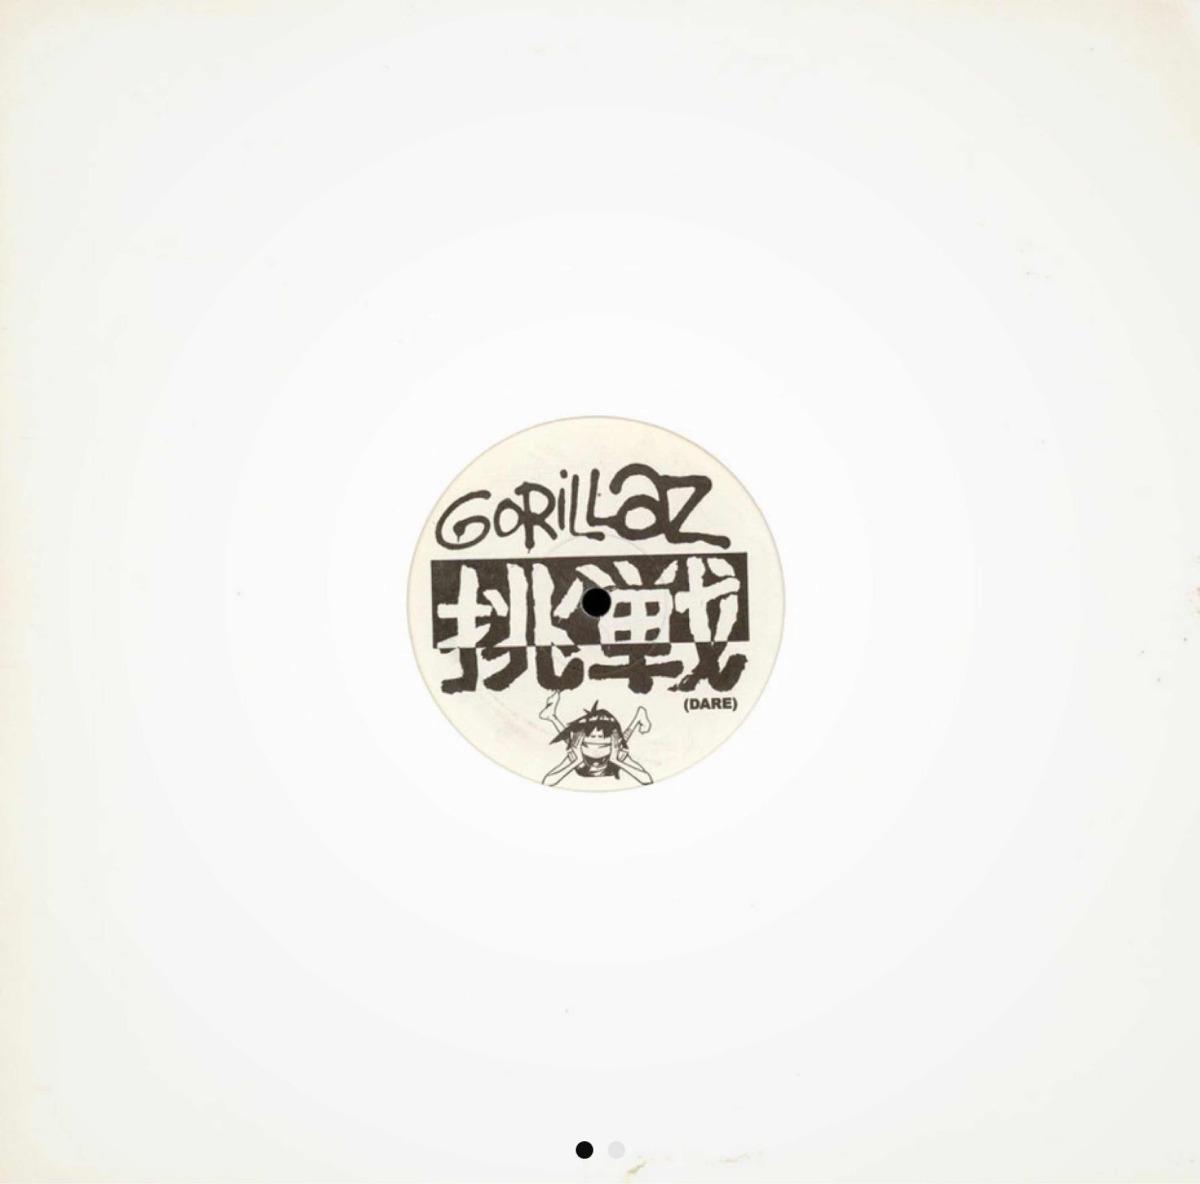 Vinilo Gorillaz - Dare